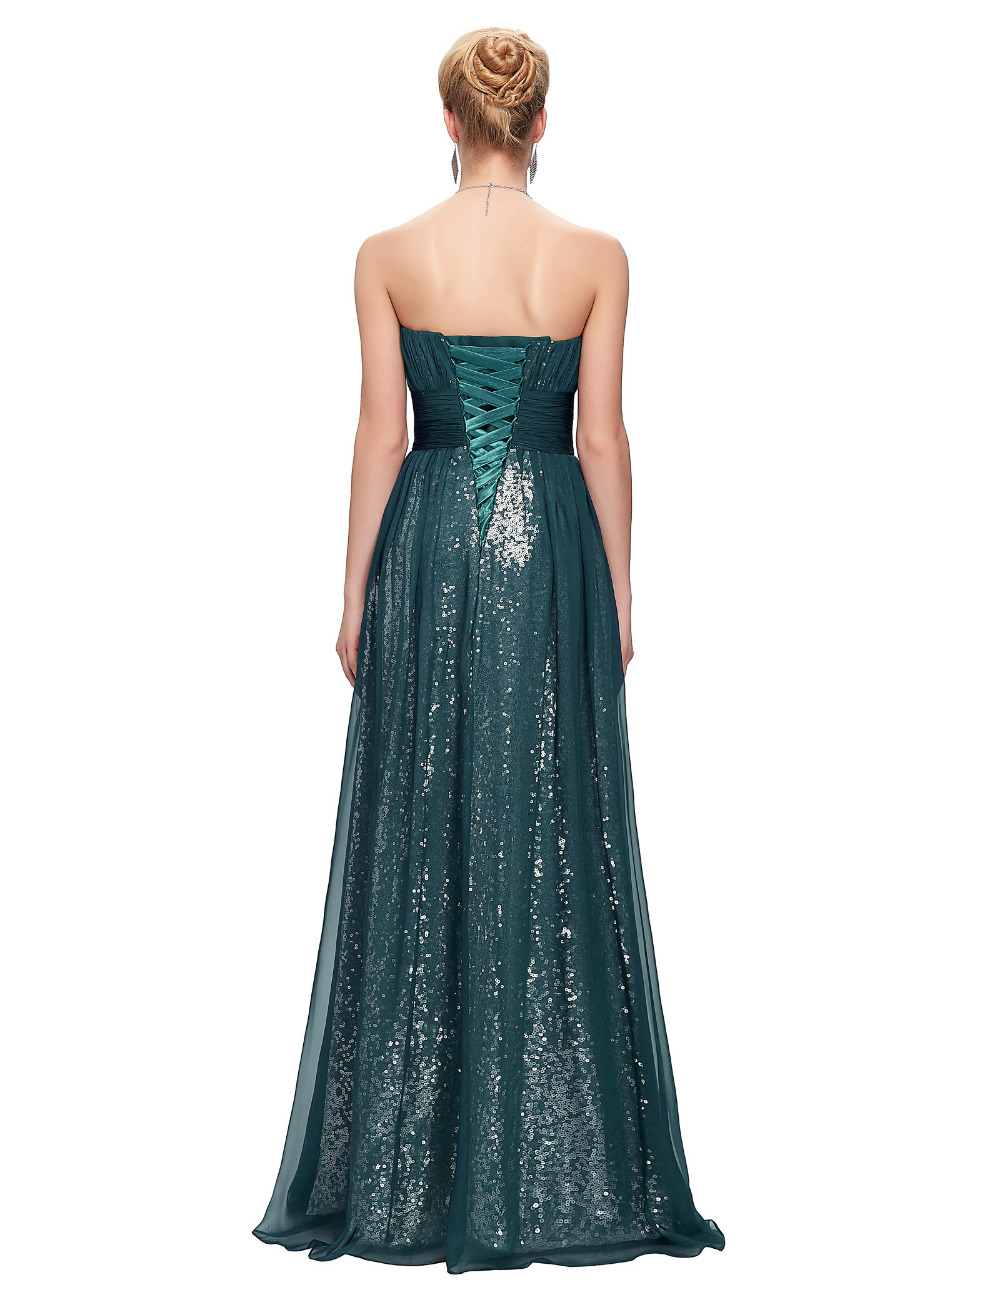 Floor Length Prom Dresses 2017 Blue Purple Green Chiffon Sequins Formal  Evening Gowns Dresses Sweetheart Long Prom Dress 6005-in Prom Dresses from  Weddings ... be3e8aeddba3